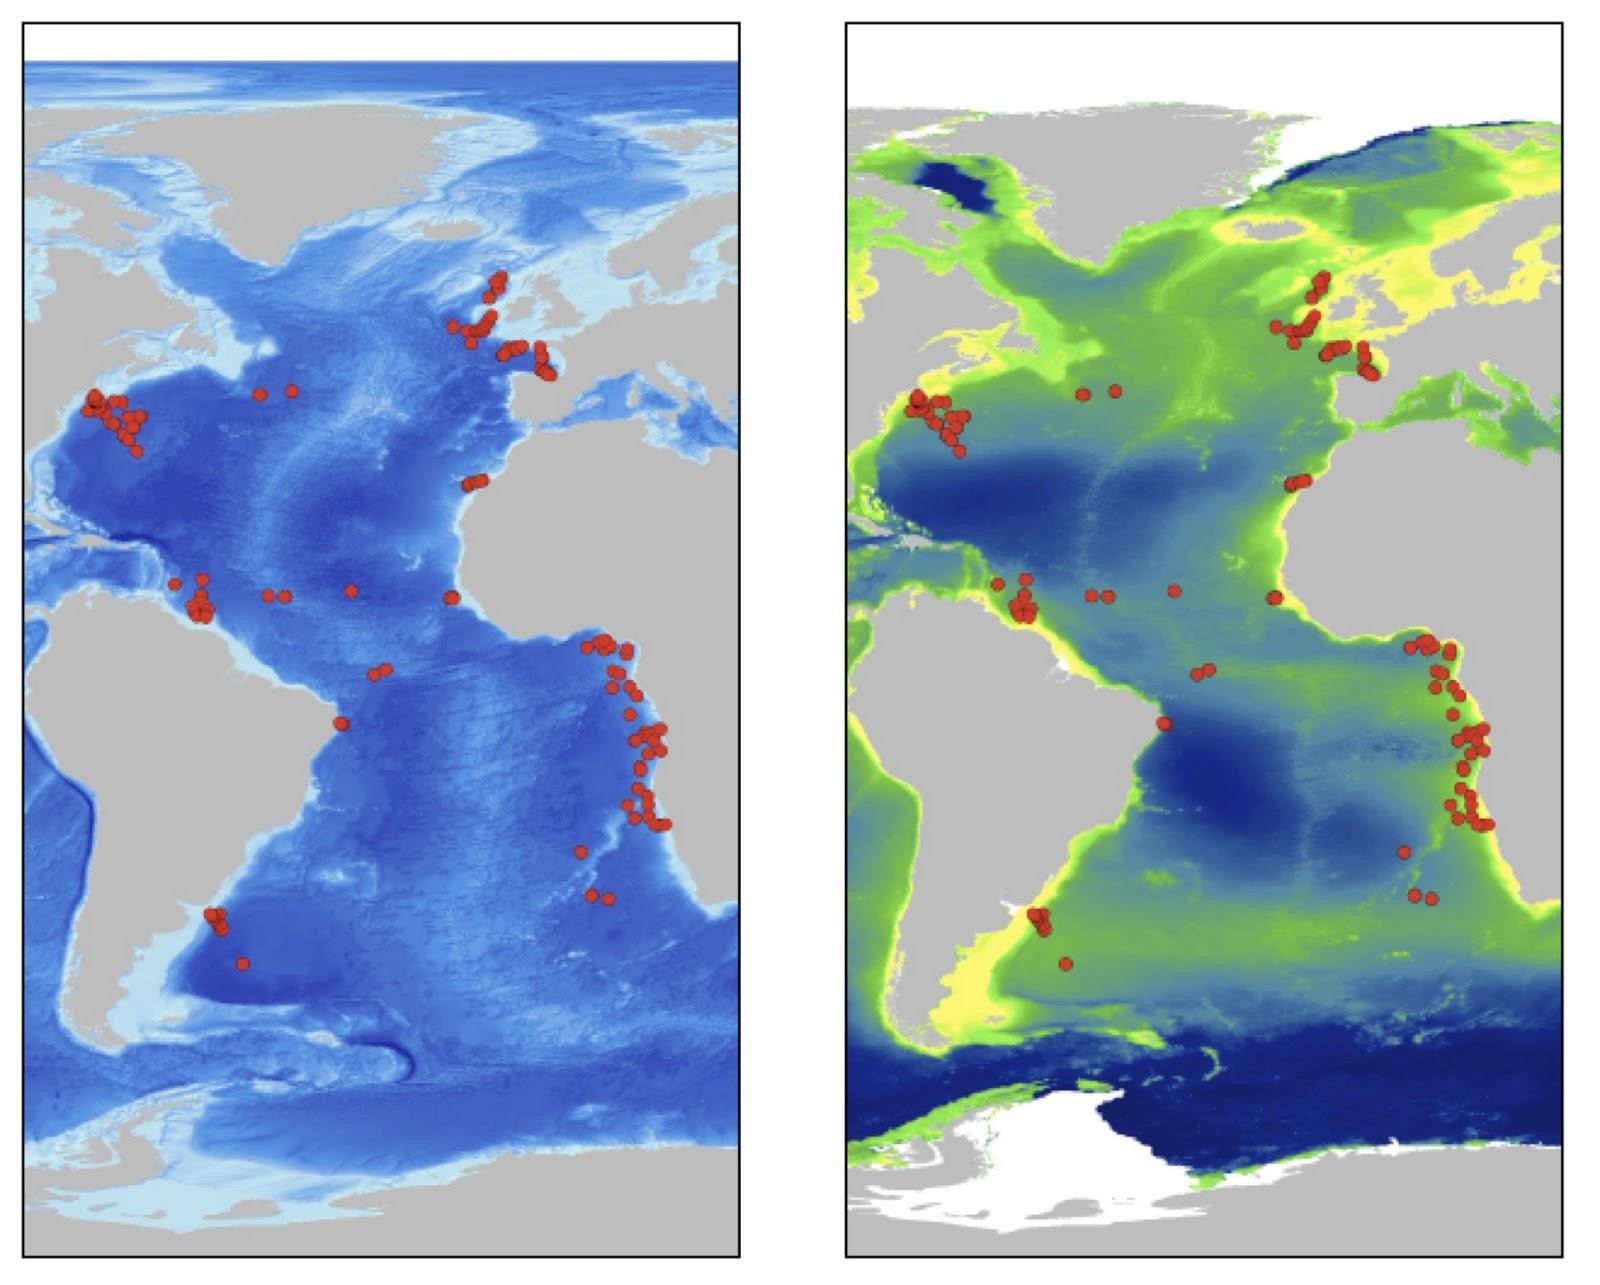 Mostly Open Ocean Deepsea Diversity - Map showing ocean depths